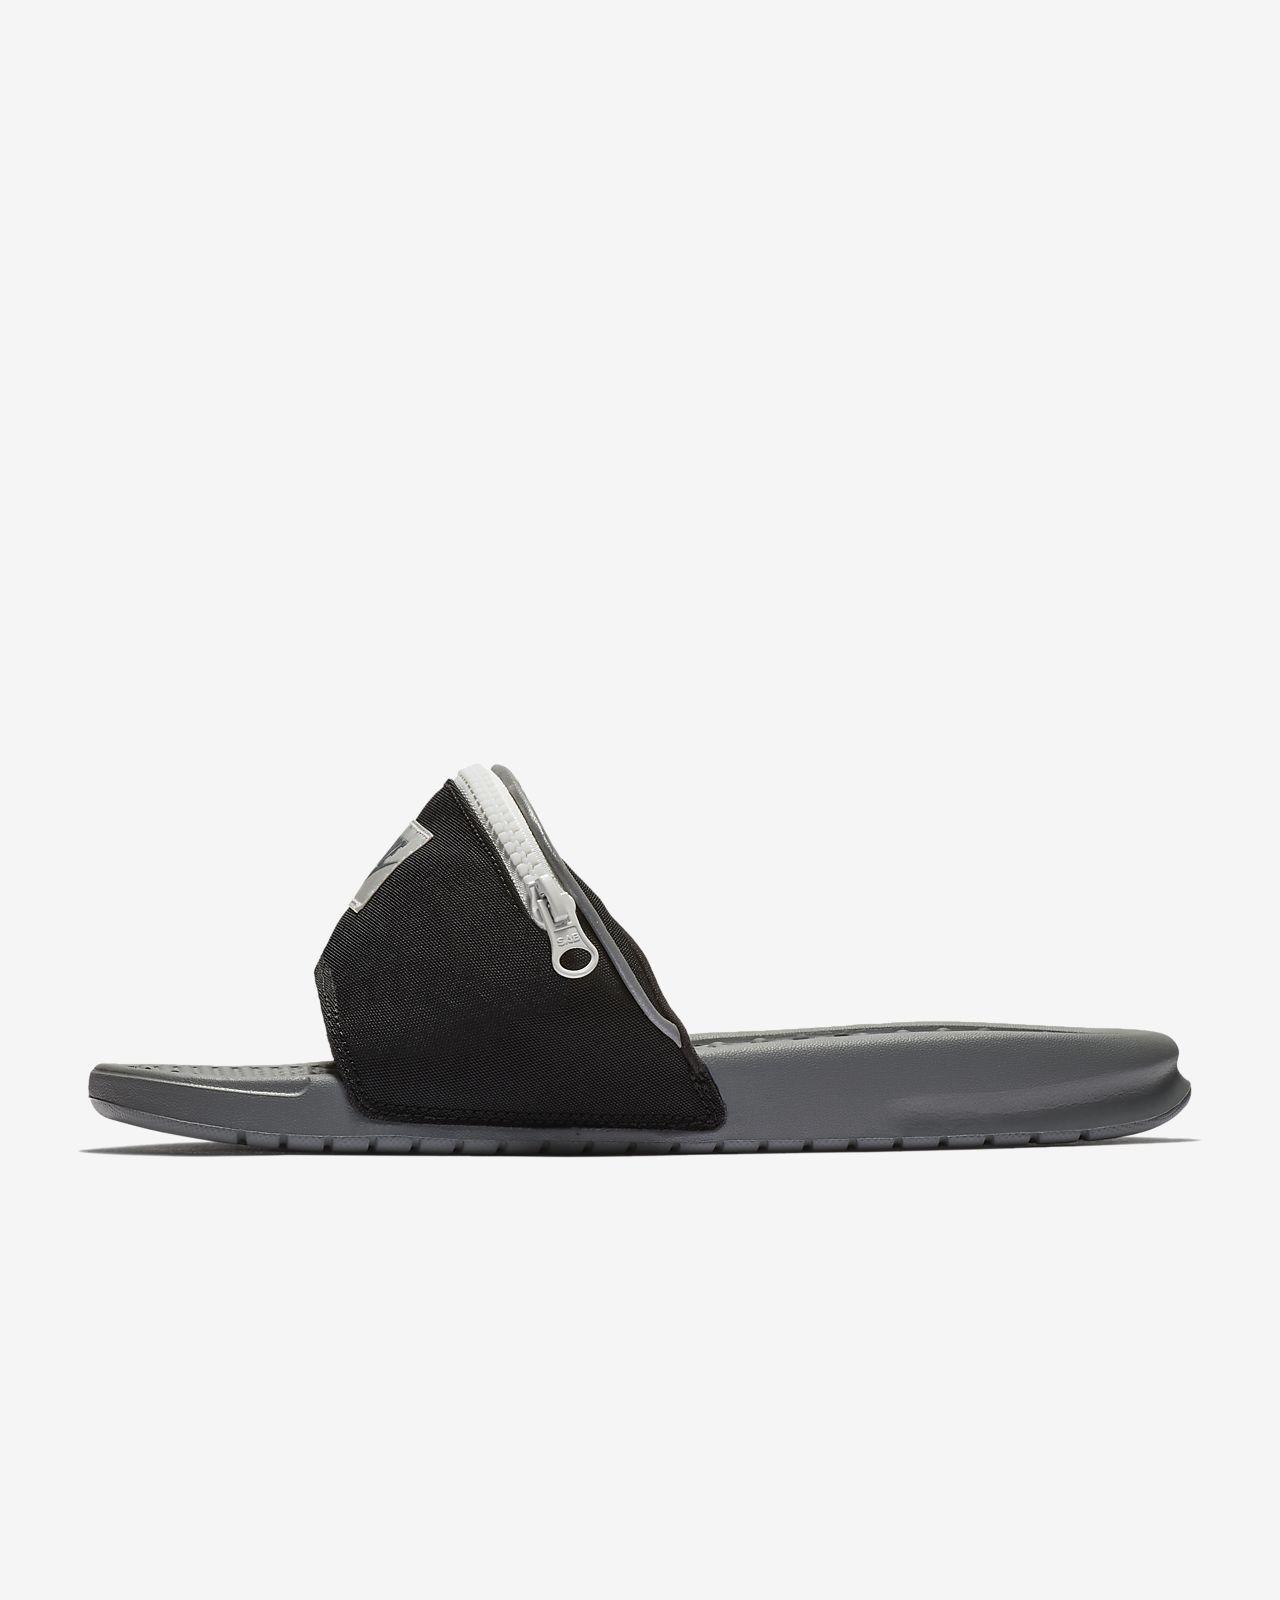 detailed look 64299 6449c ... Claquette Nike Benassi JDI Fanny Pack pour Homme